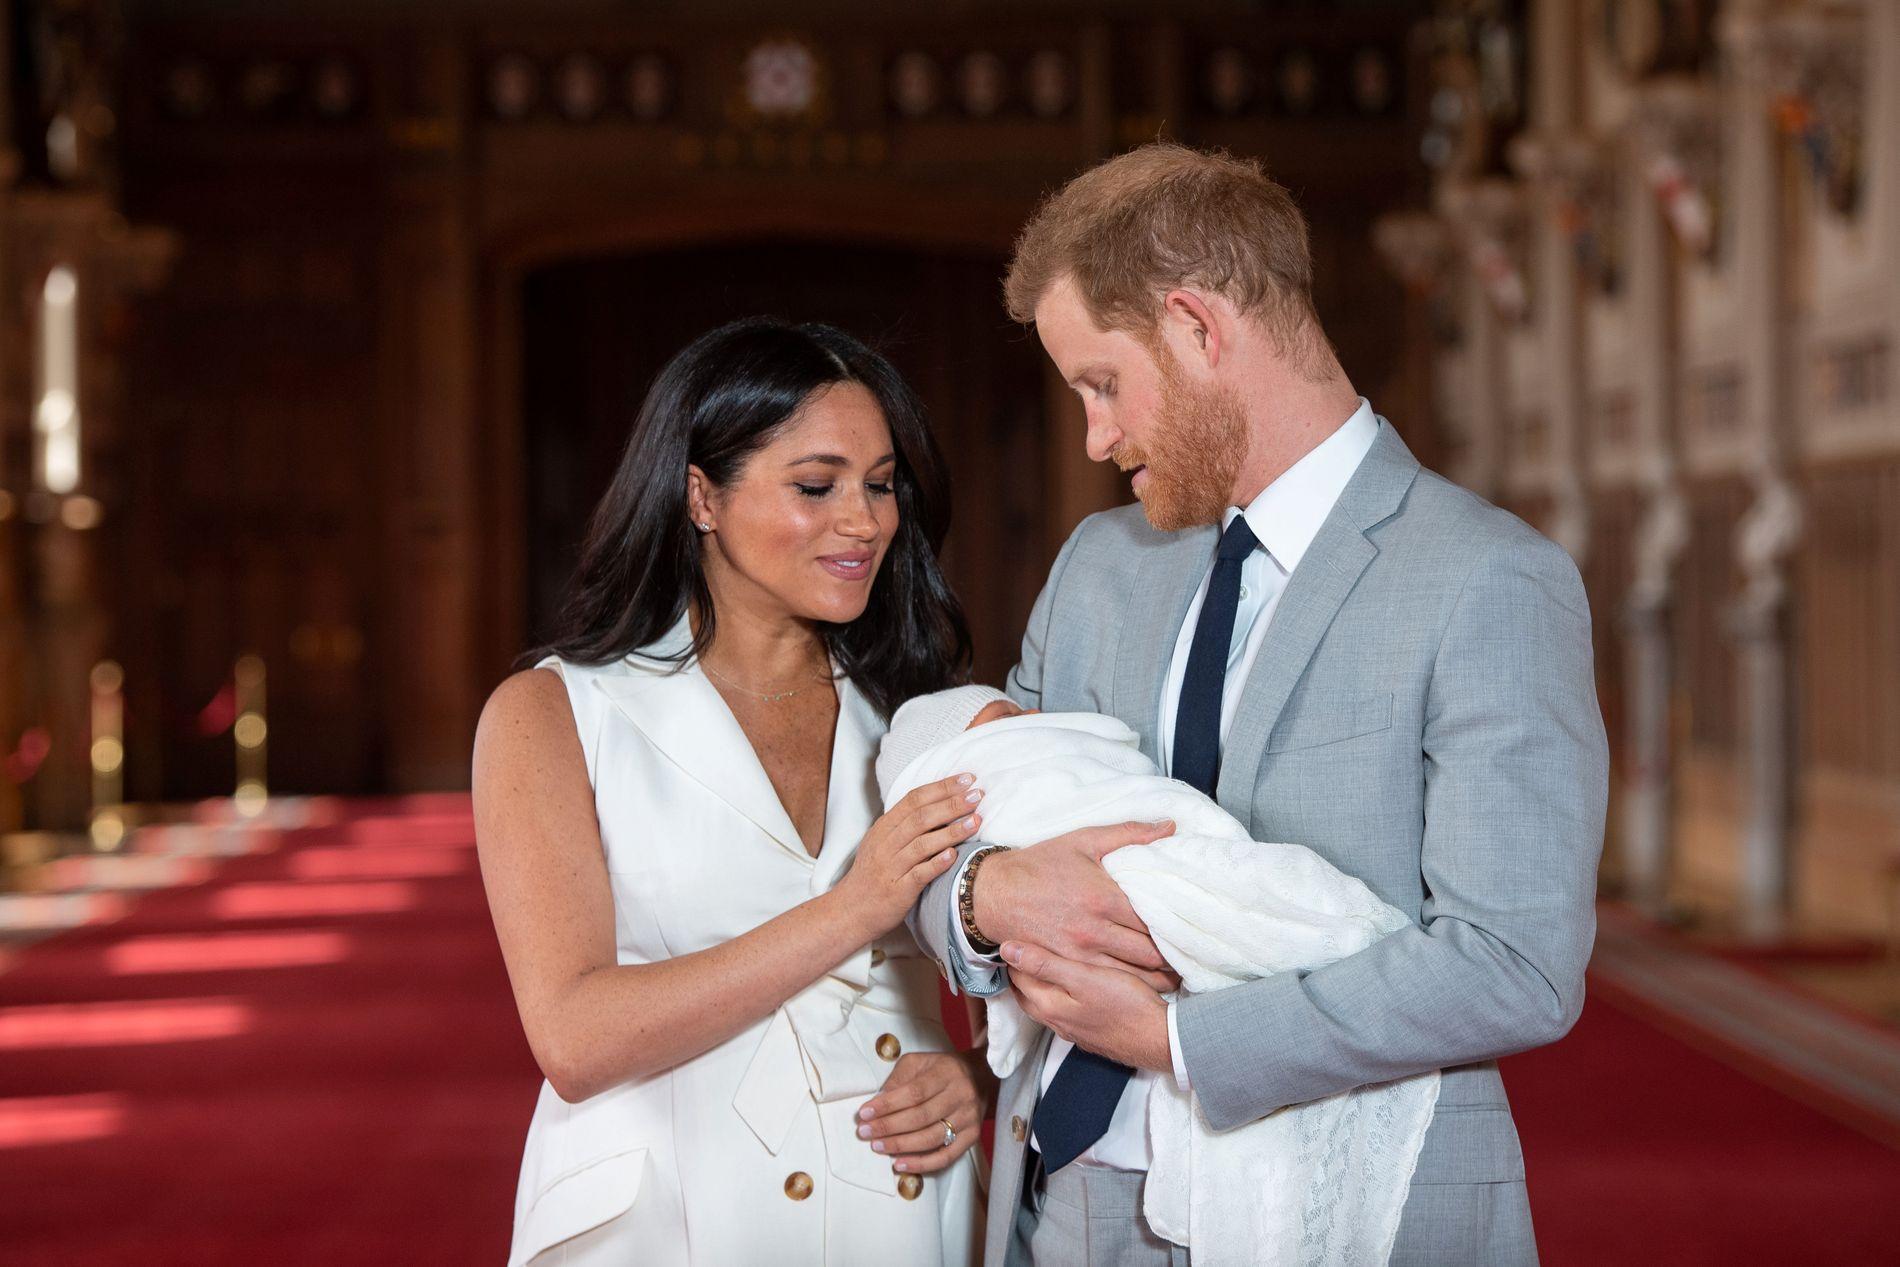 FØRSTE BILDET:  Onsdag viste prins Harry og hertuginne Meghan frem lille Archie Harrison Mountbatten-Windsor.